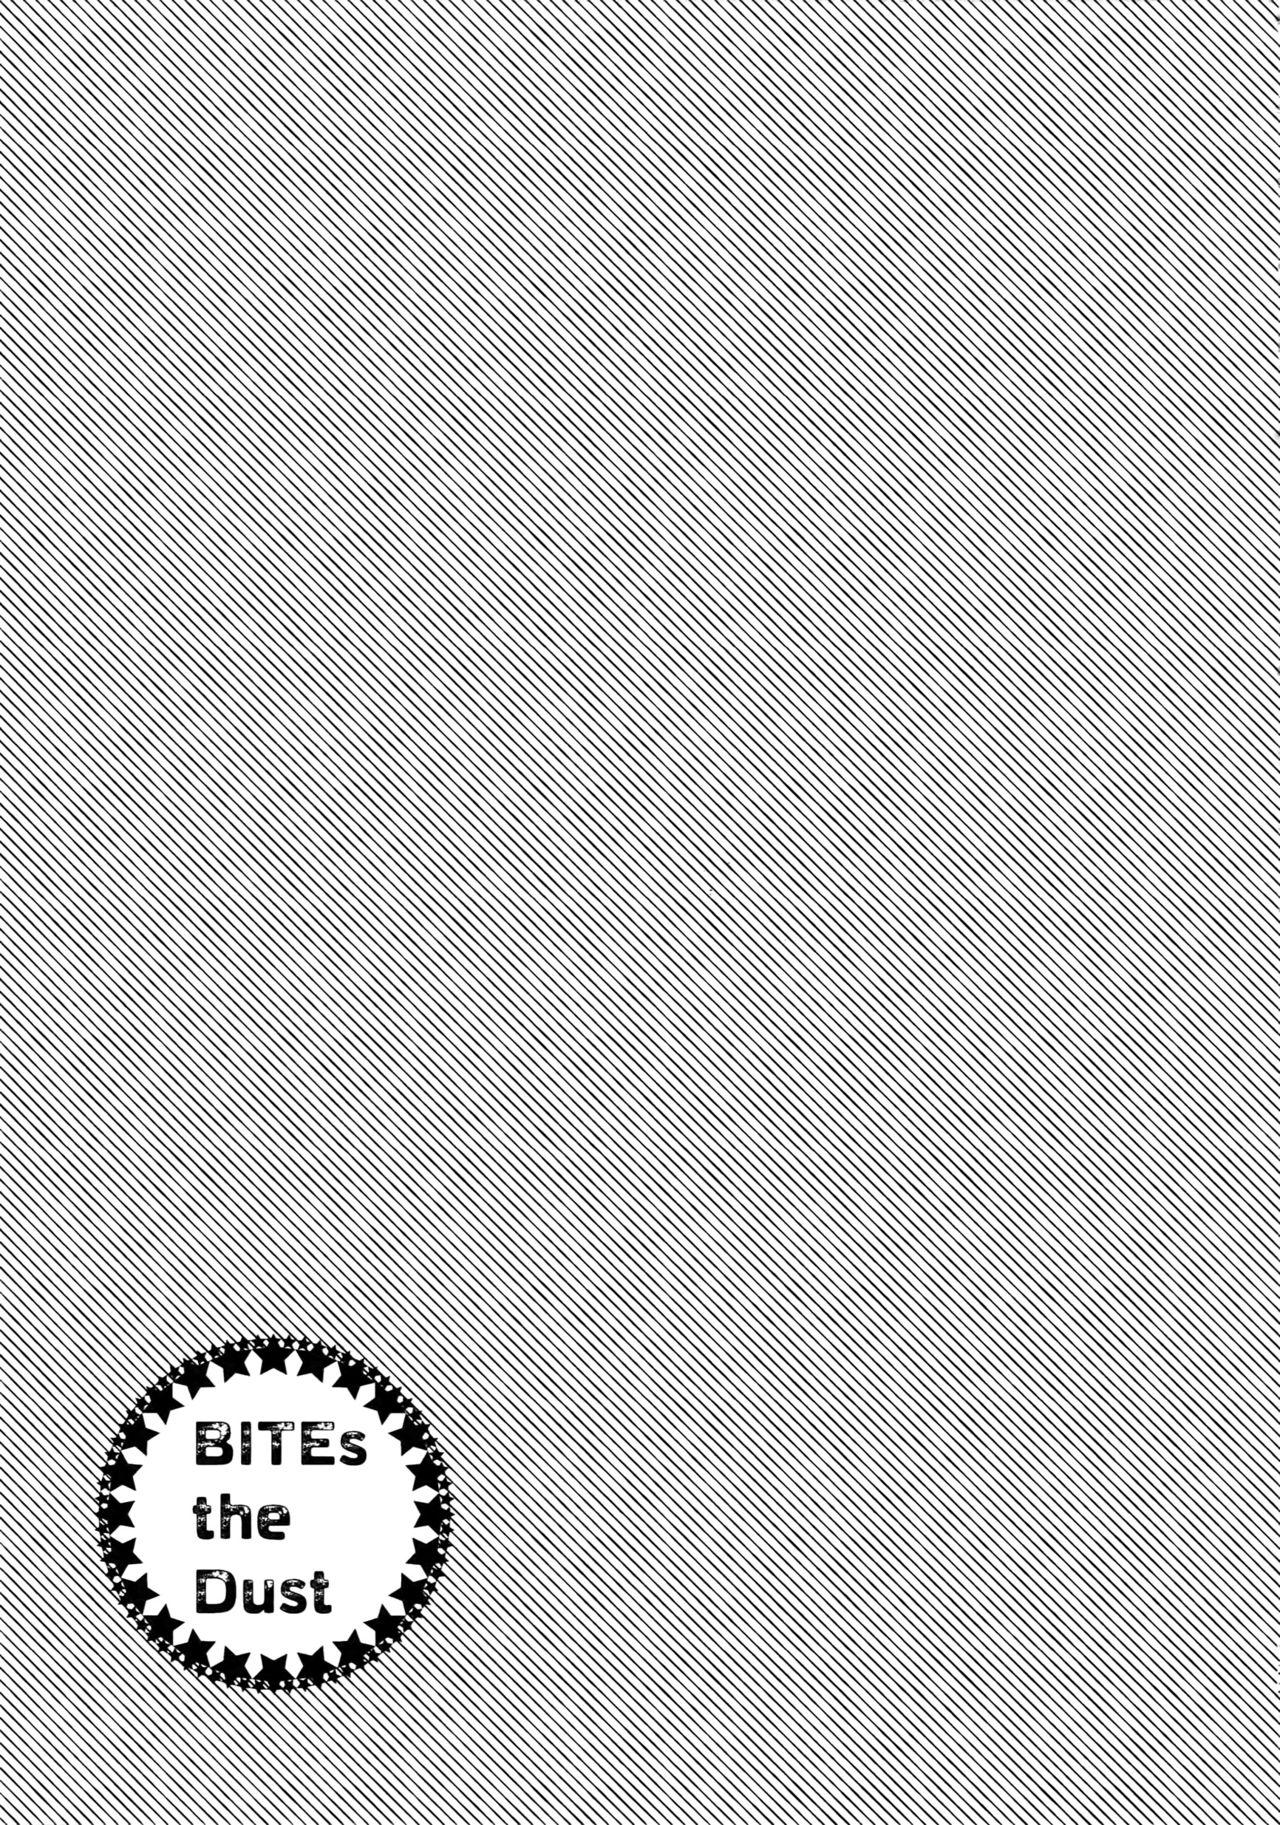 BITEs the Dust 132